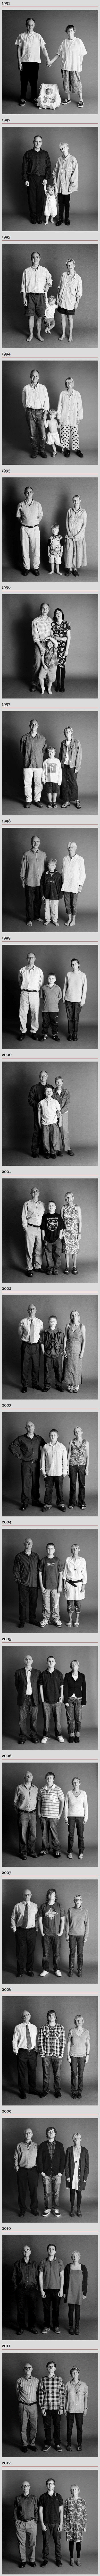 Zed Nelson-The family